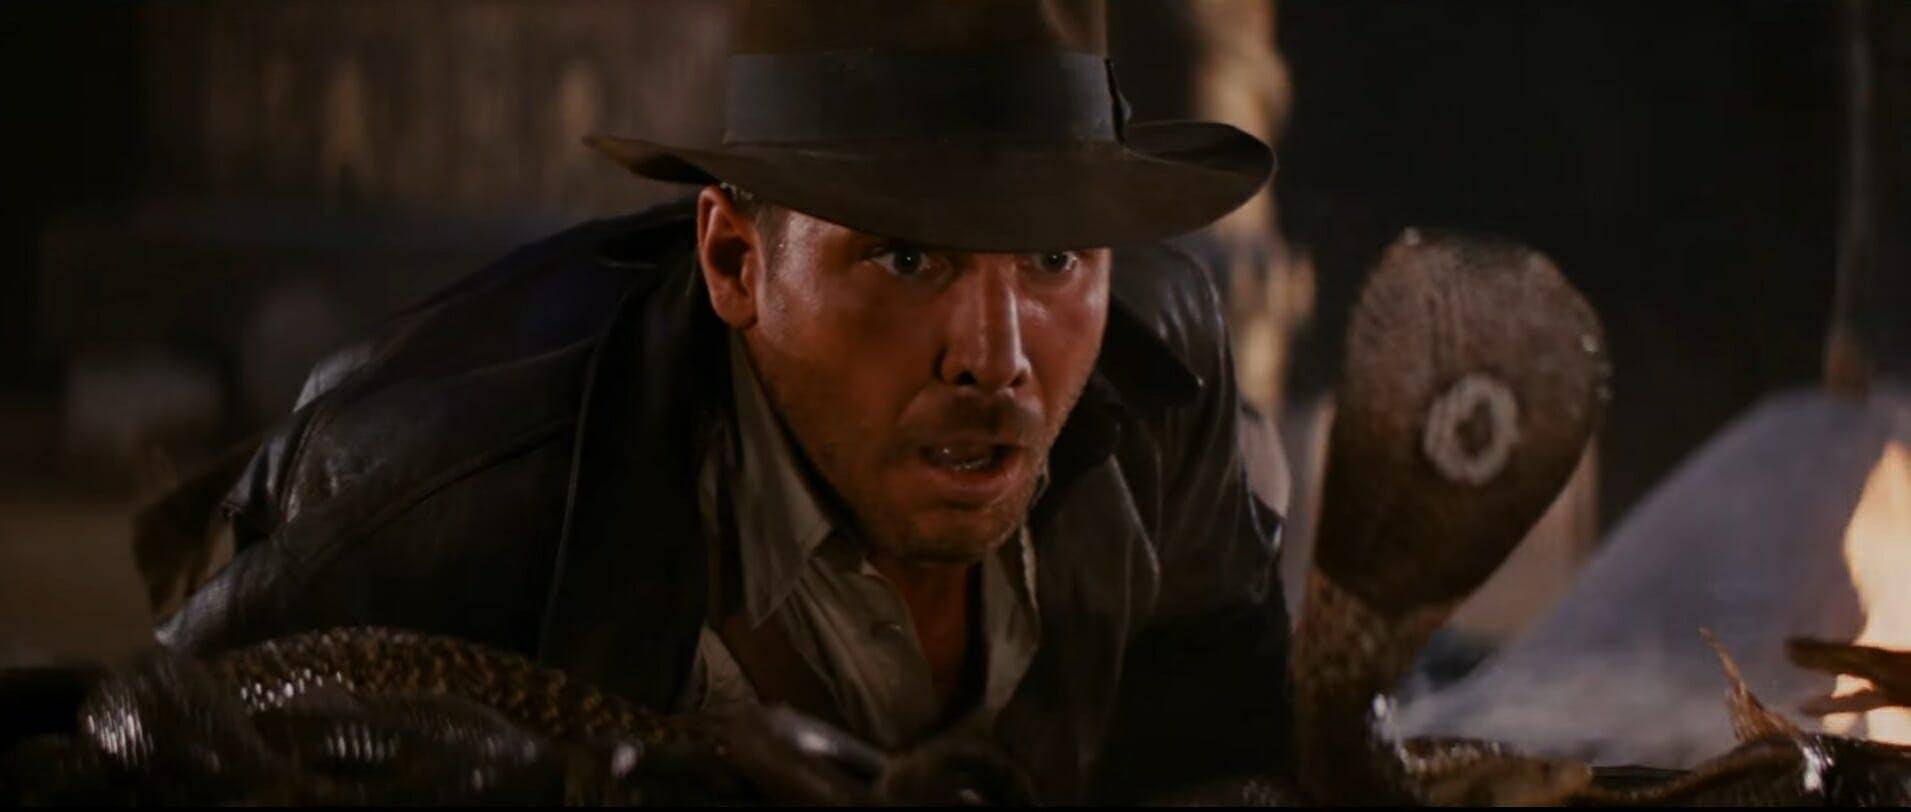 Amazon kids movies - Raiders of the Lost Ark